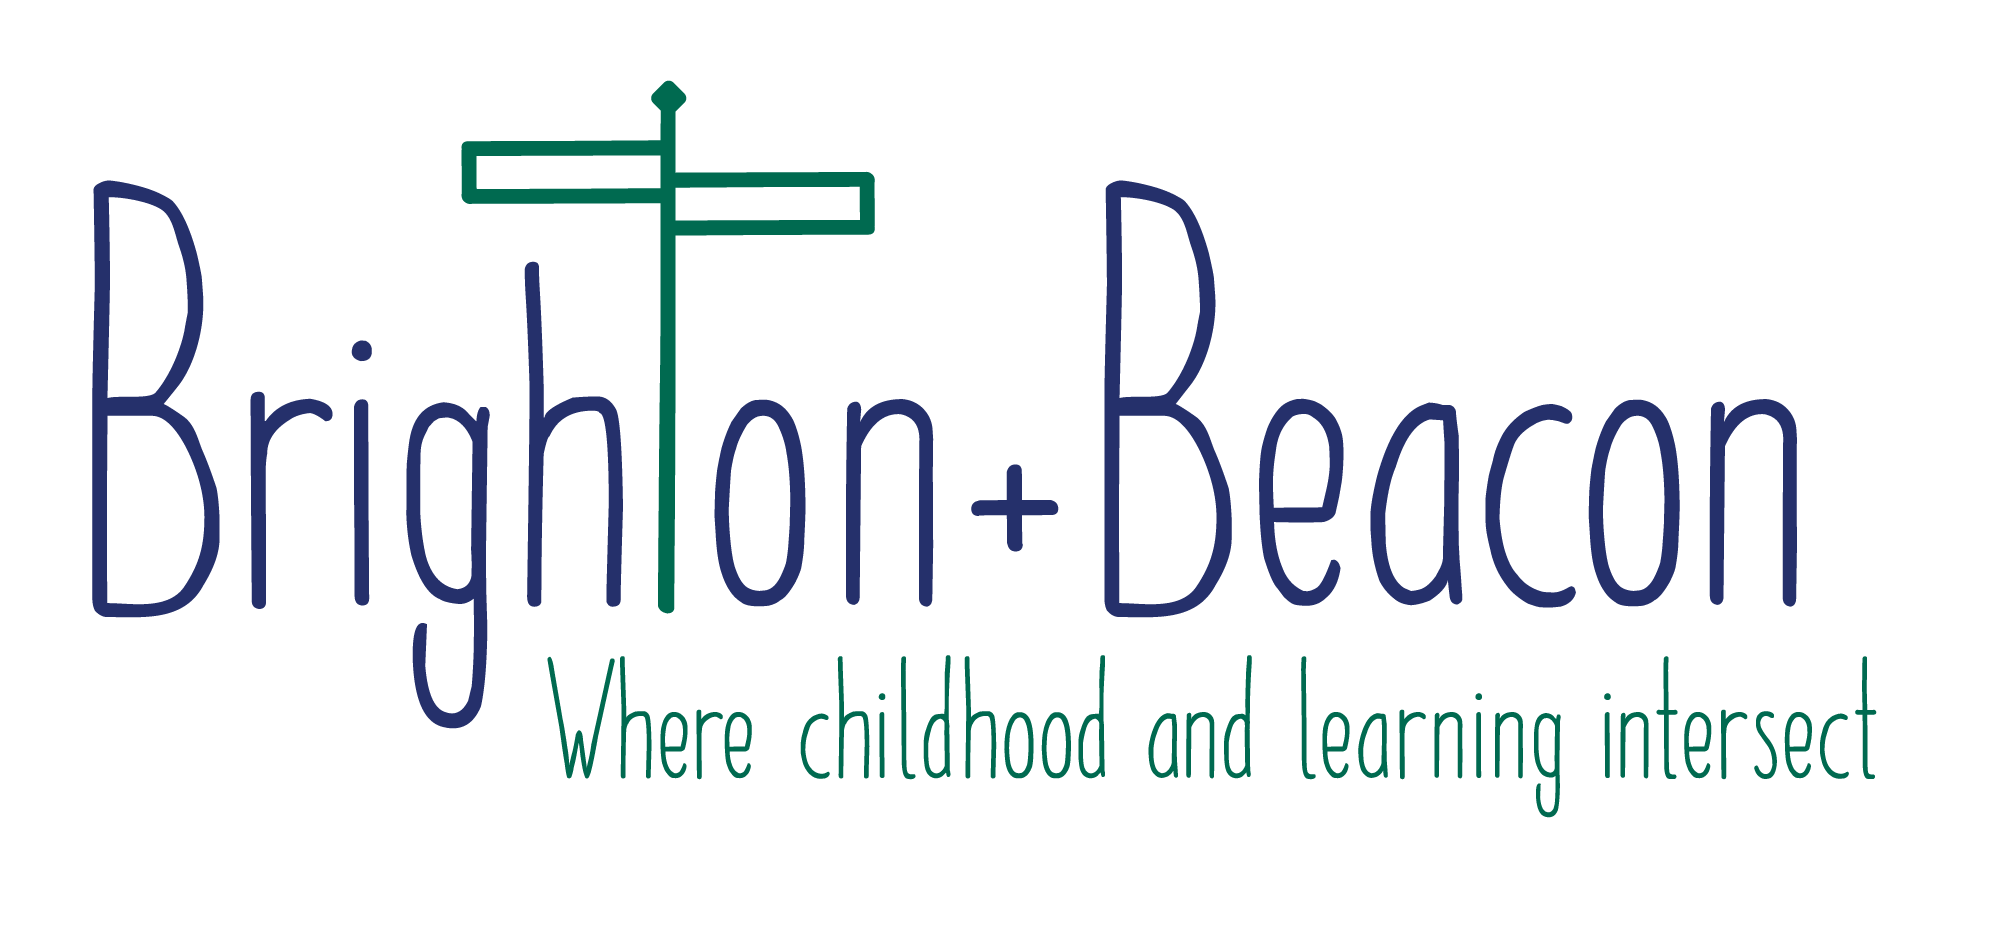 Brighton and Beacon